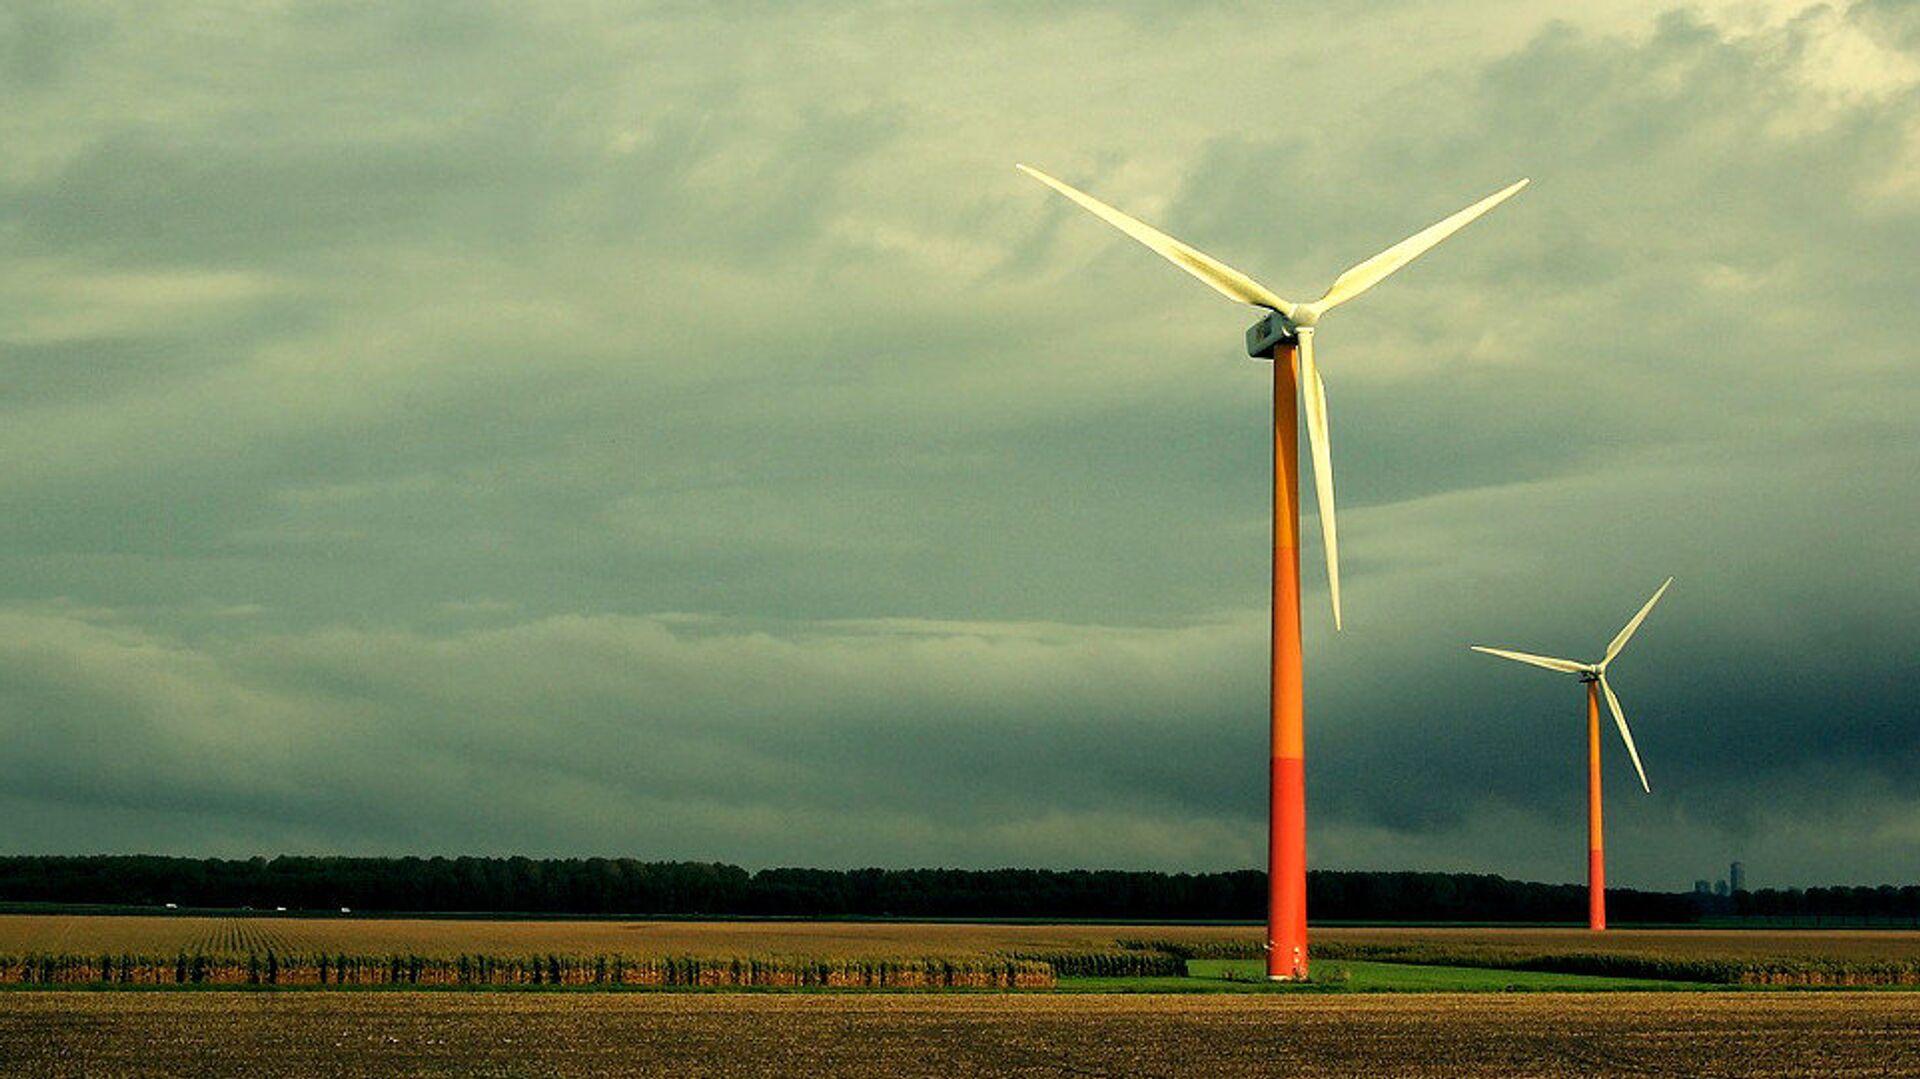 A wind turbine - Sputnik International, 1920, 08.09.2021